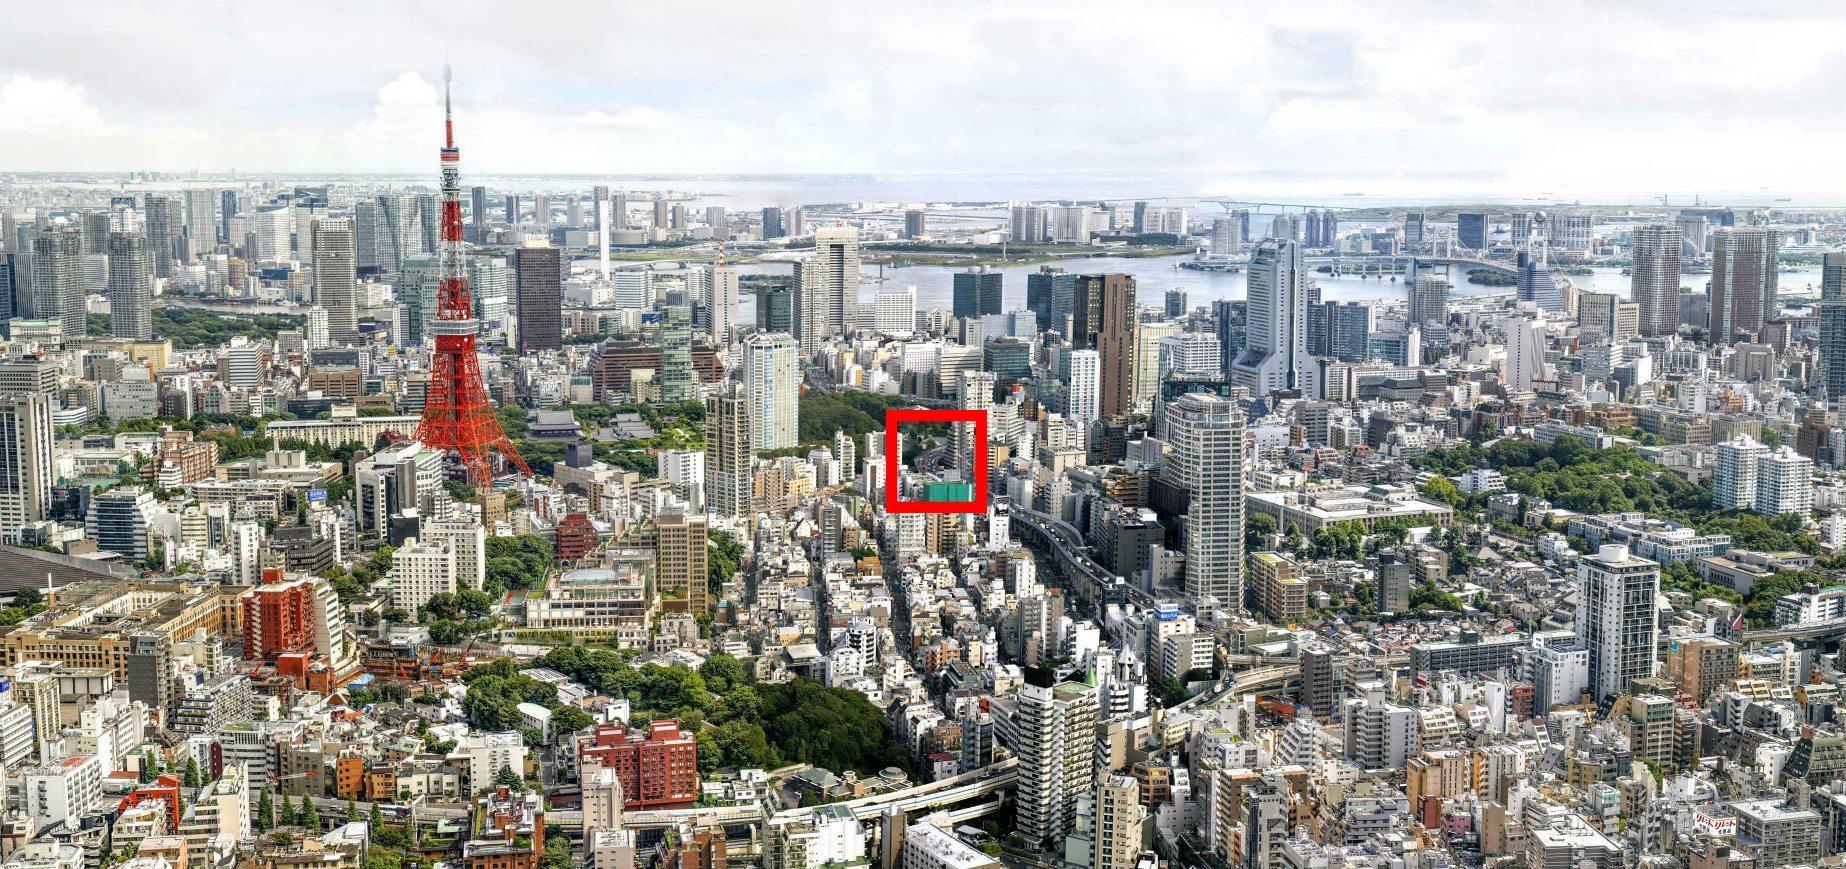 Tokyo-Roppongi-Gigapixel-(13)